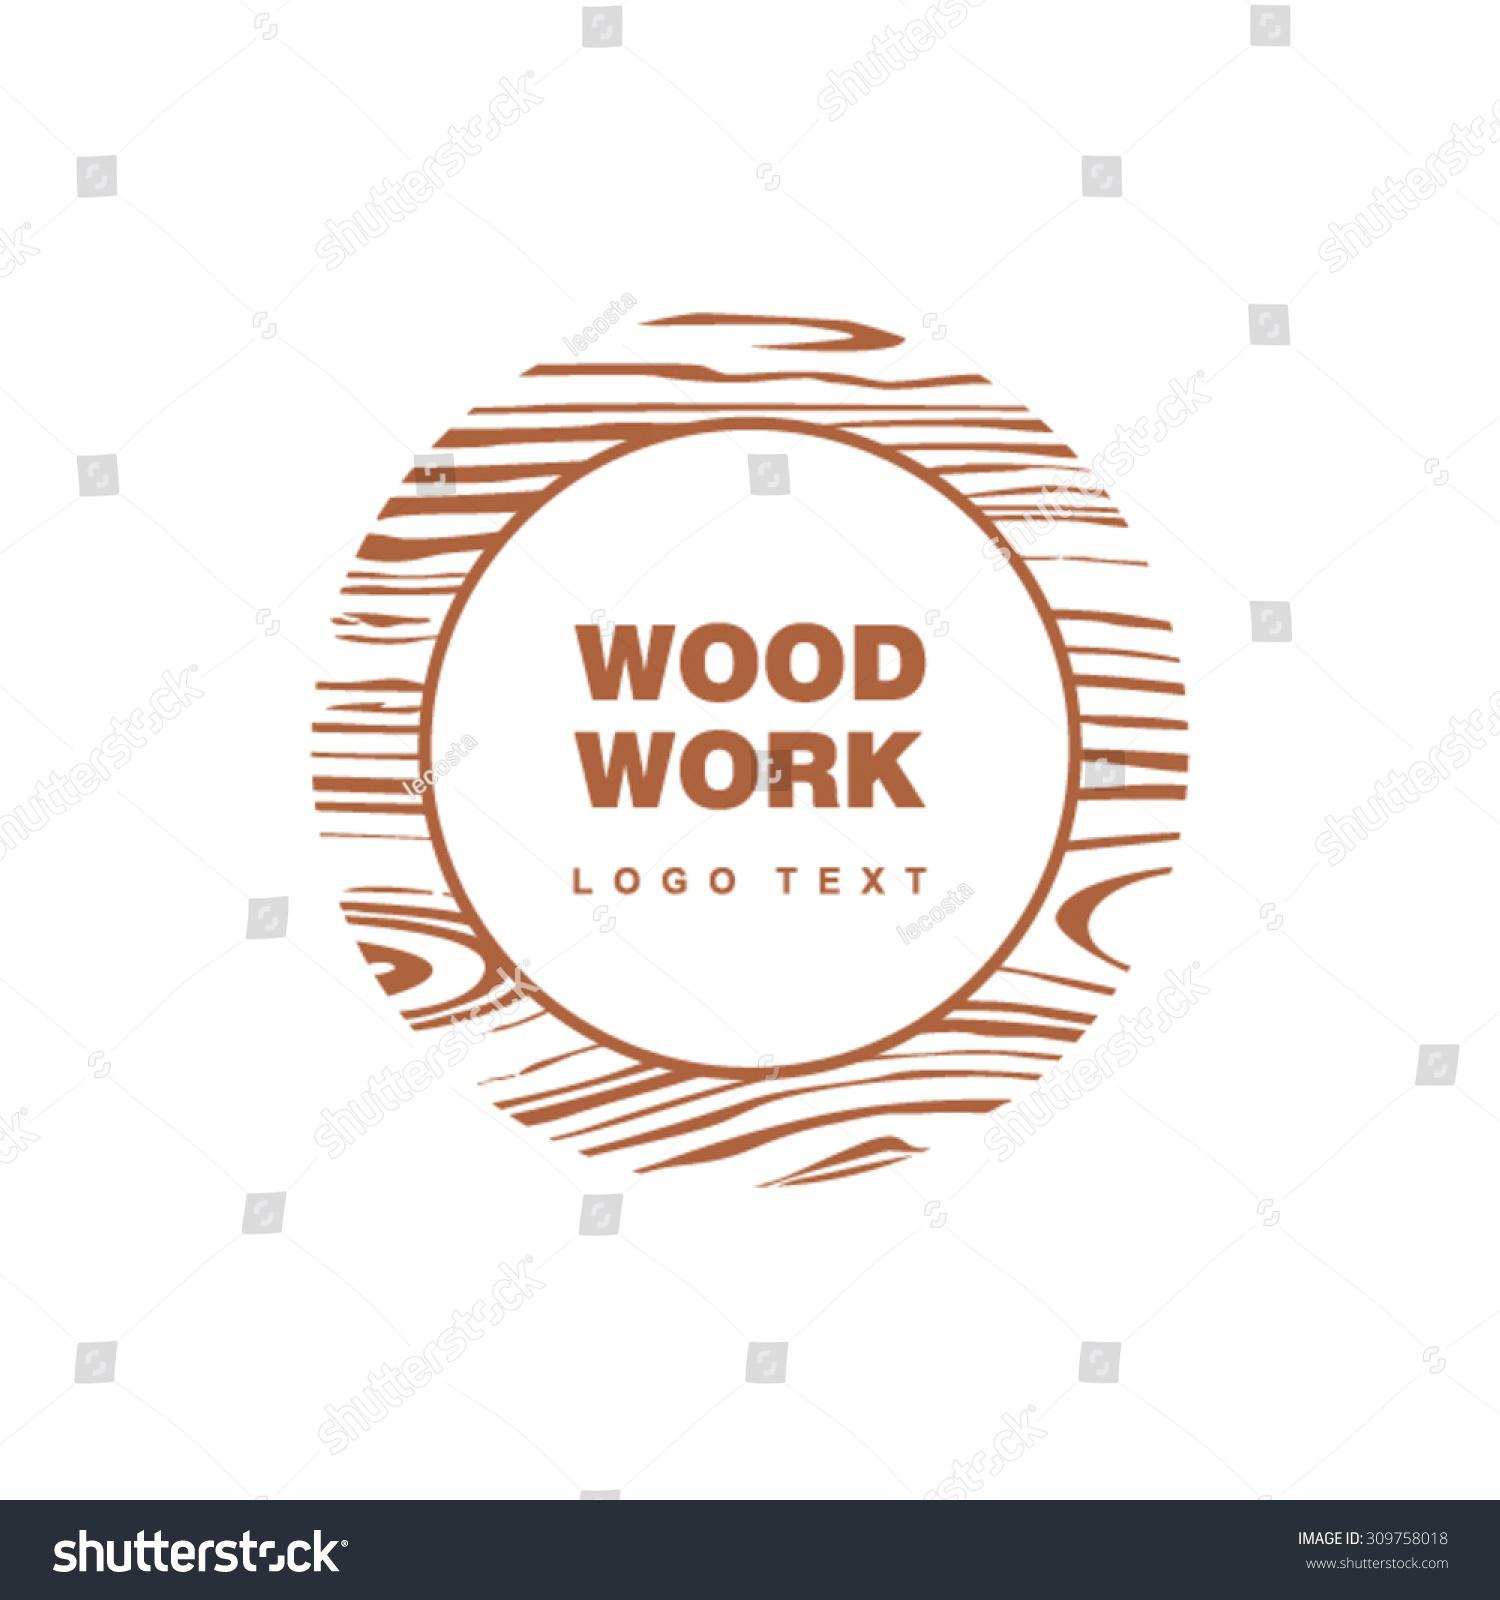 Woods Lumber Logo ~ Woodwork logo circle wooden pattern stock vector